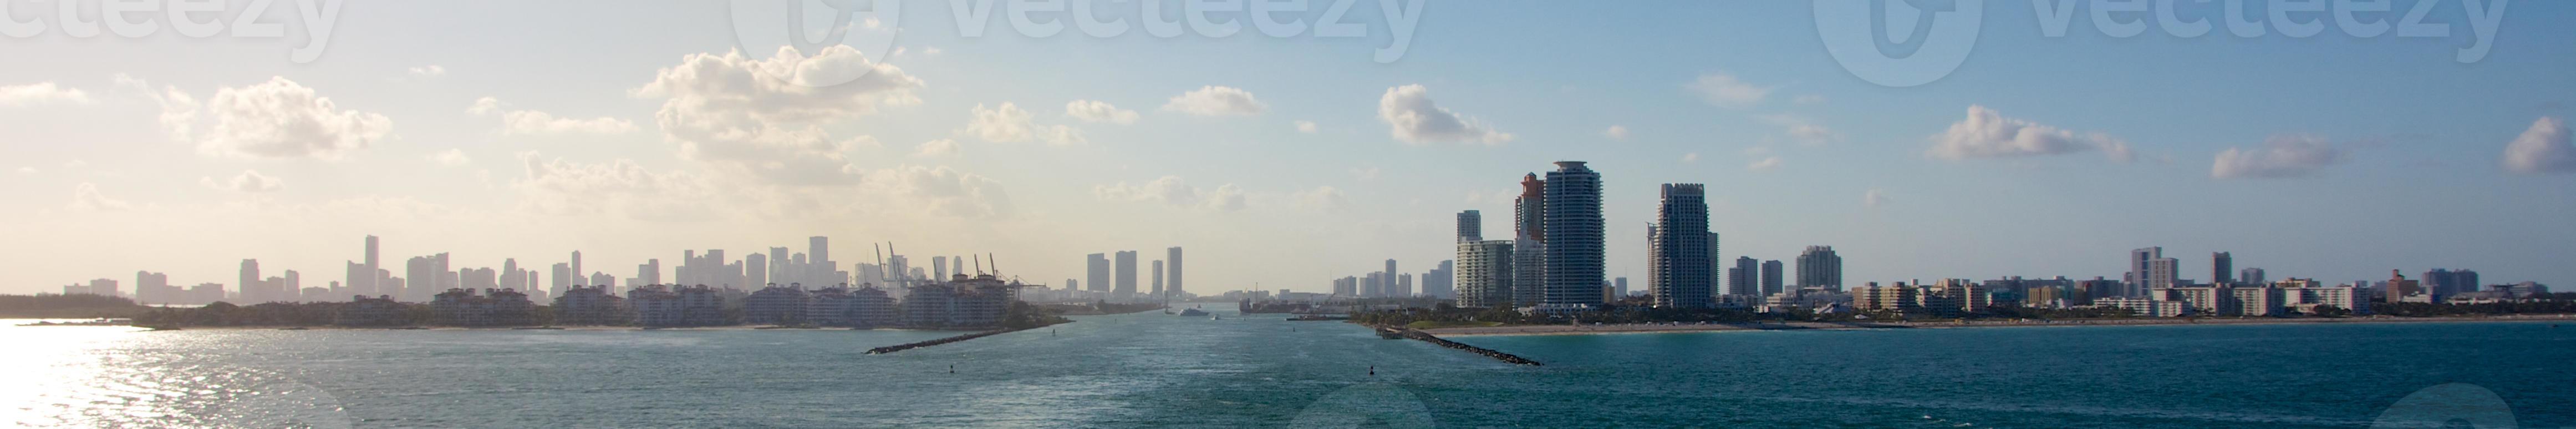 panorama do porto de miami foto